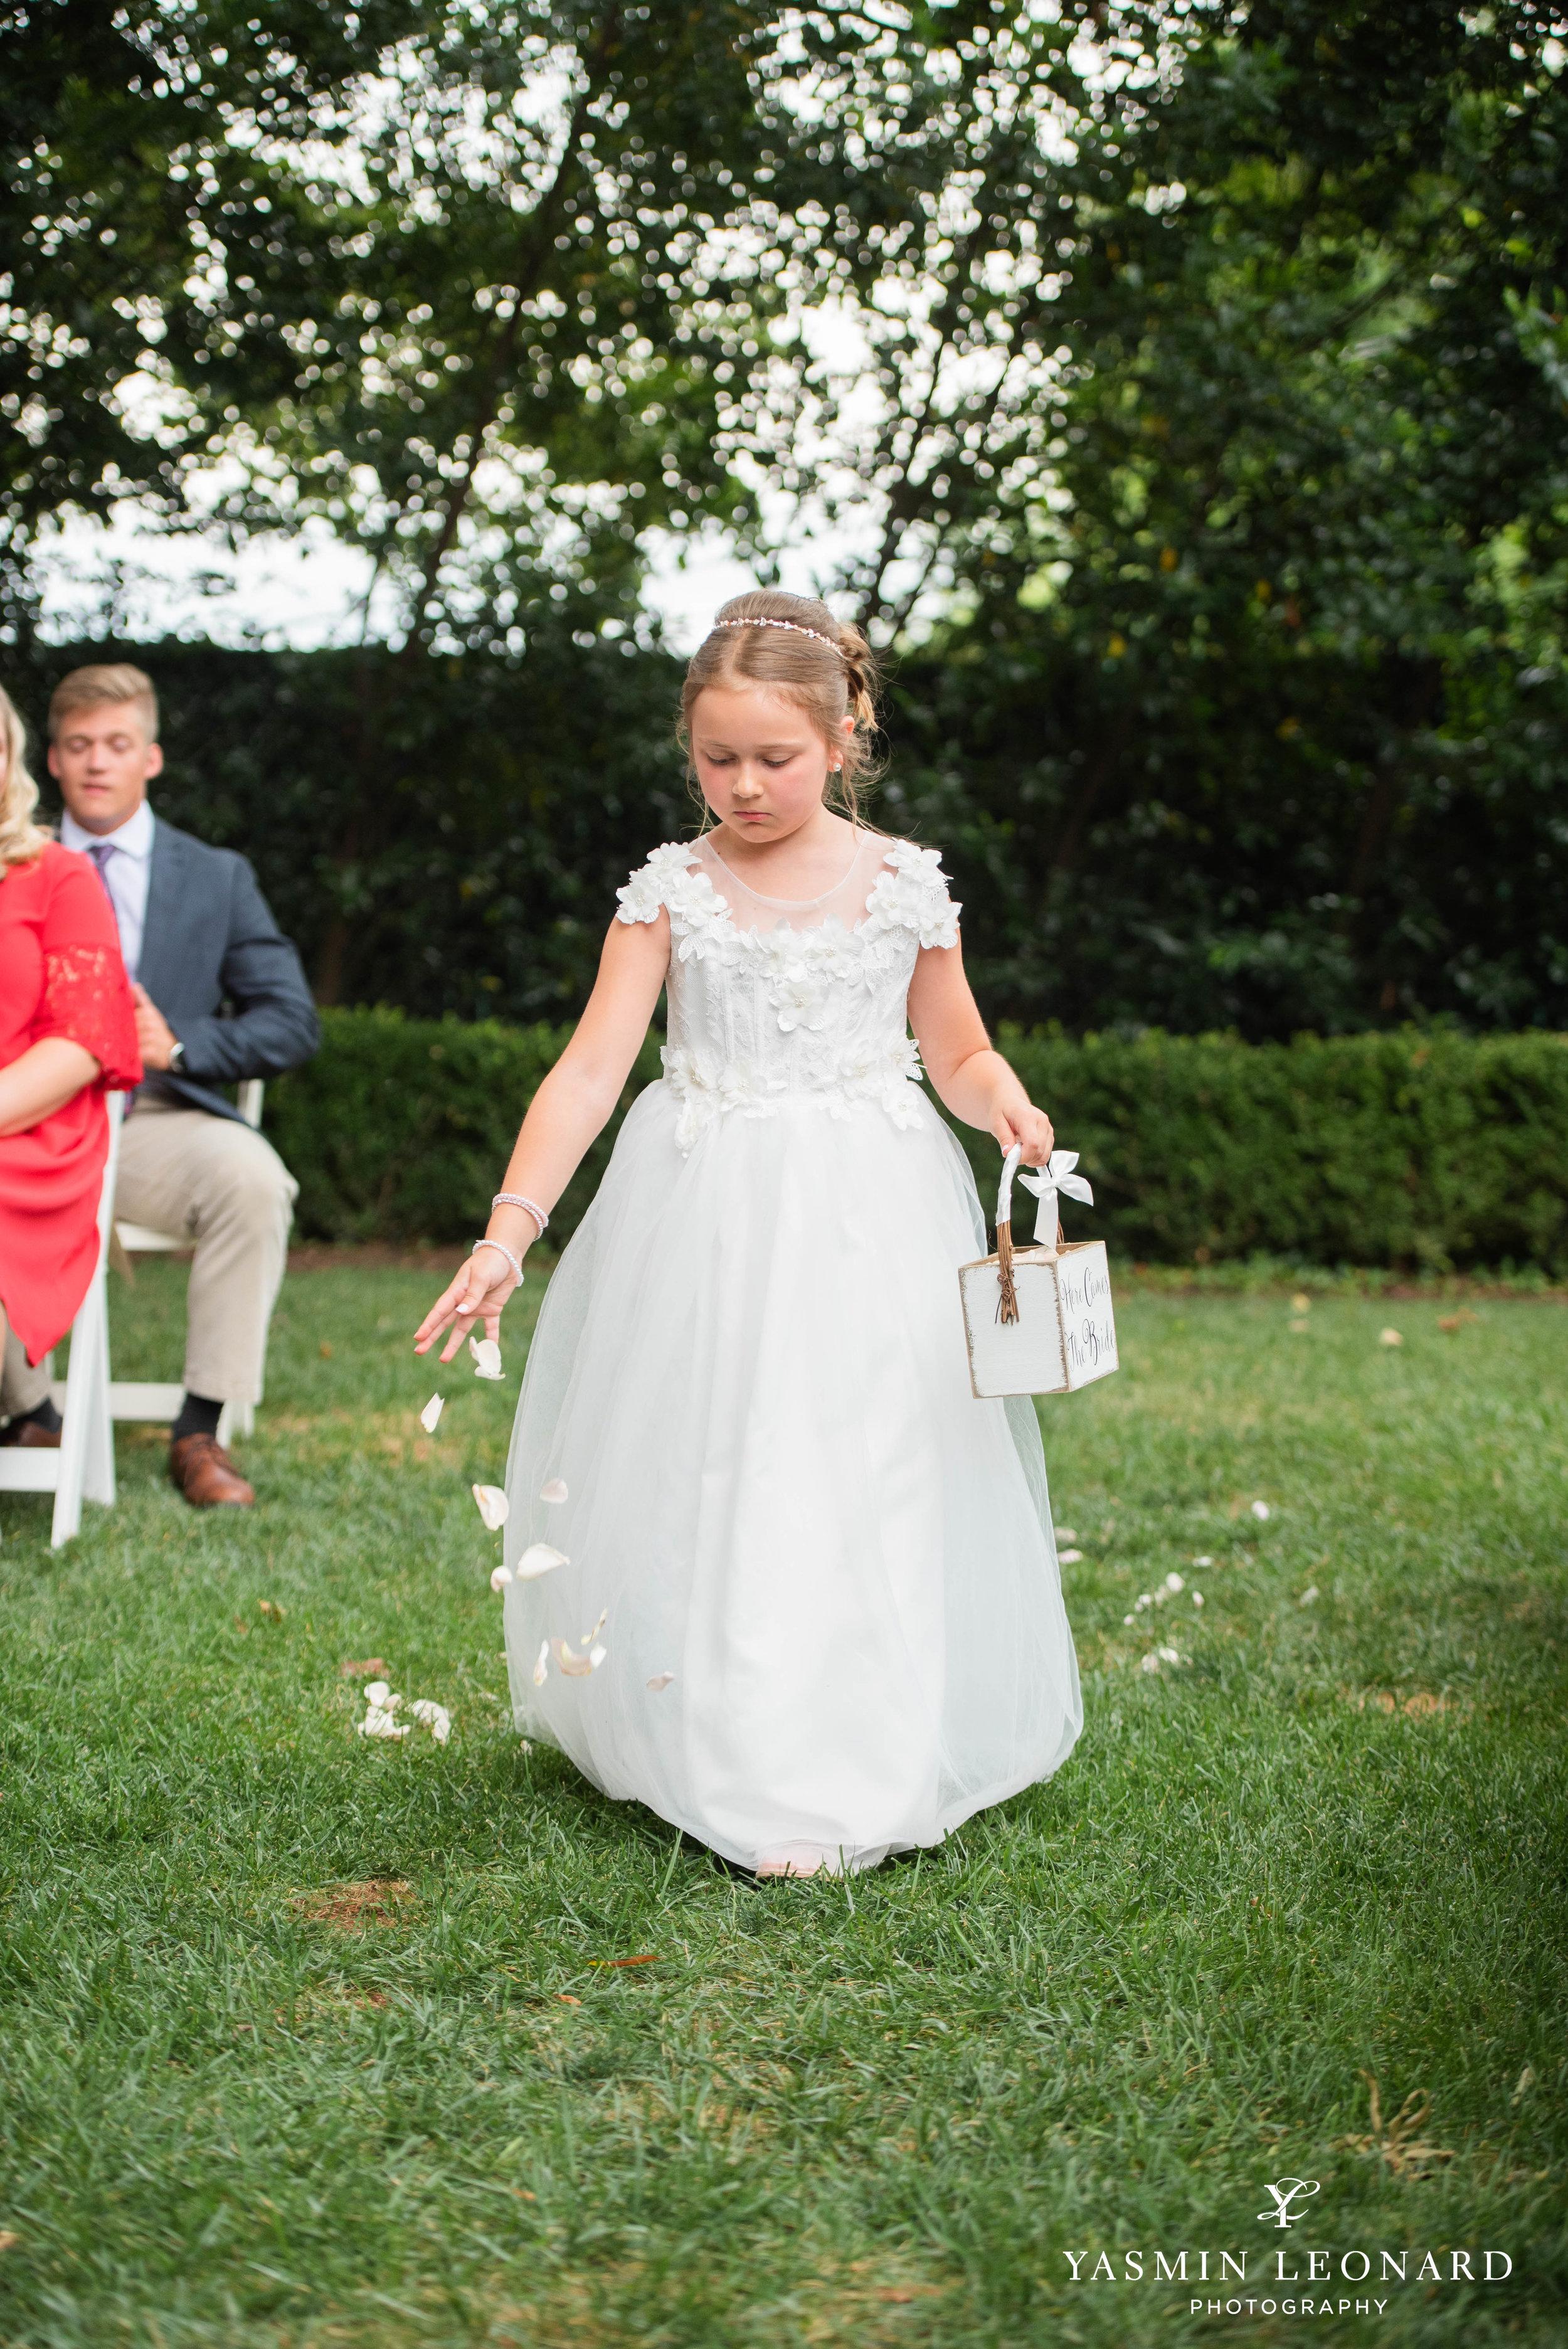 Separk Mansion - NC Weddings - Gastonia Wedding - NC Wedding Venues - Pink and Blue Wedding Ideas - Pink Bridesmaid Dresses - Yasmin Leonard Photography-18.jpg